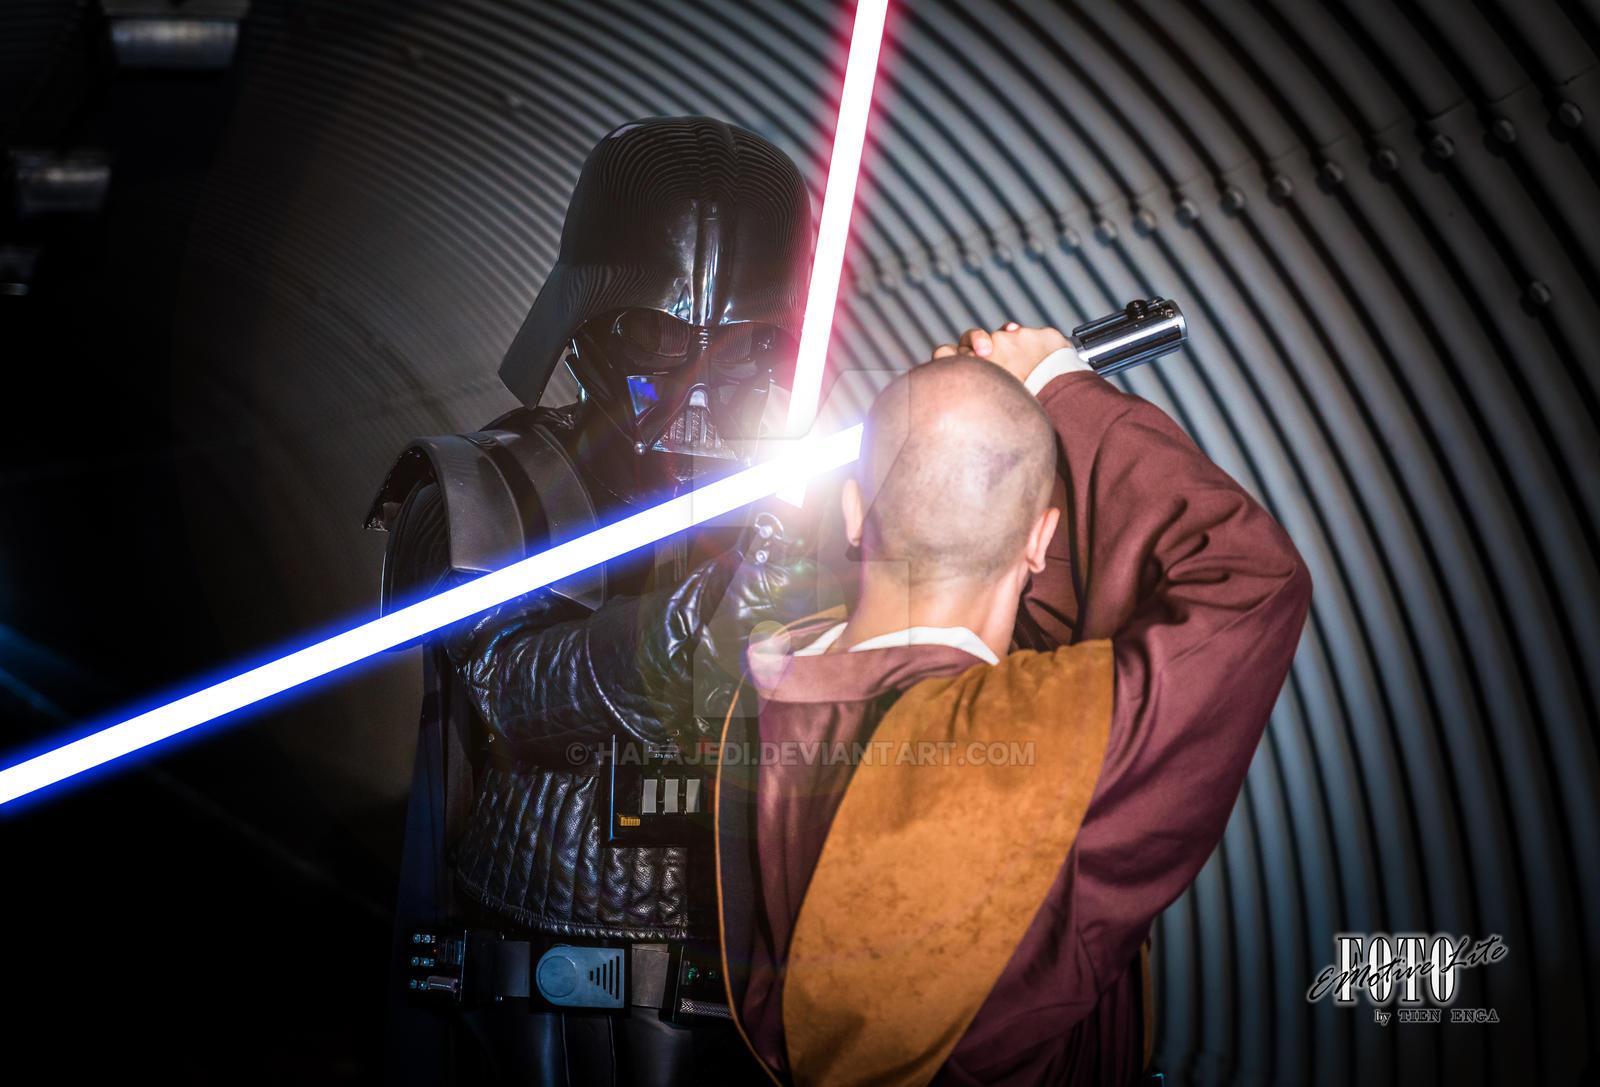 Vader Versus Jedi by hapajedi